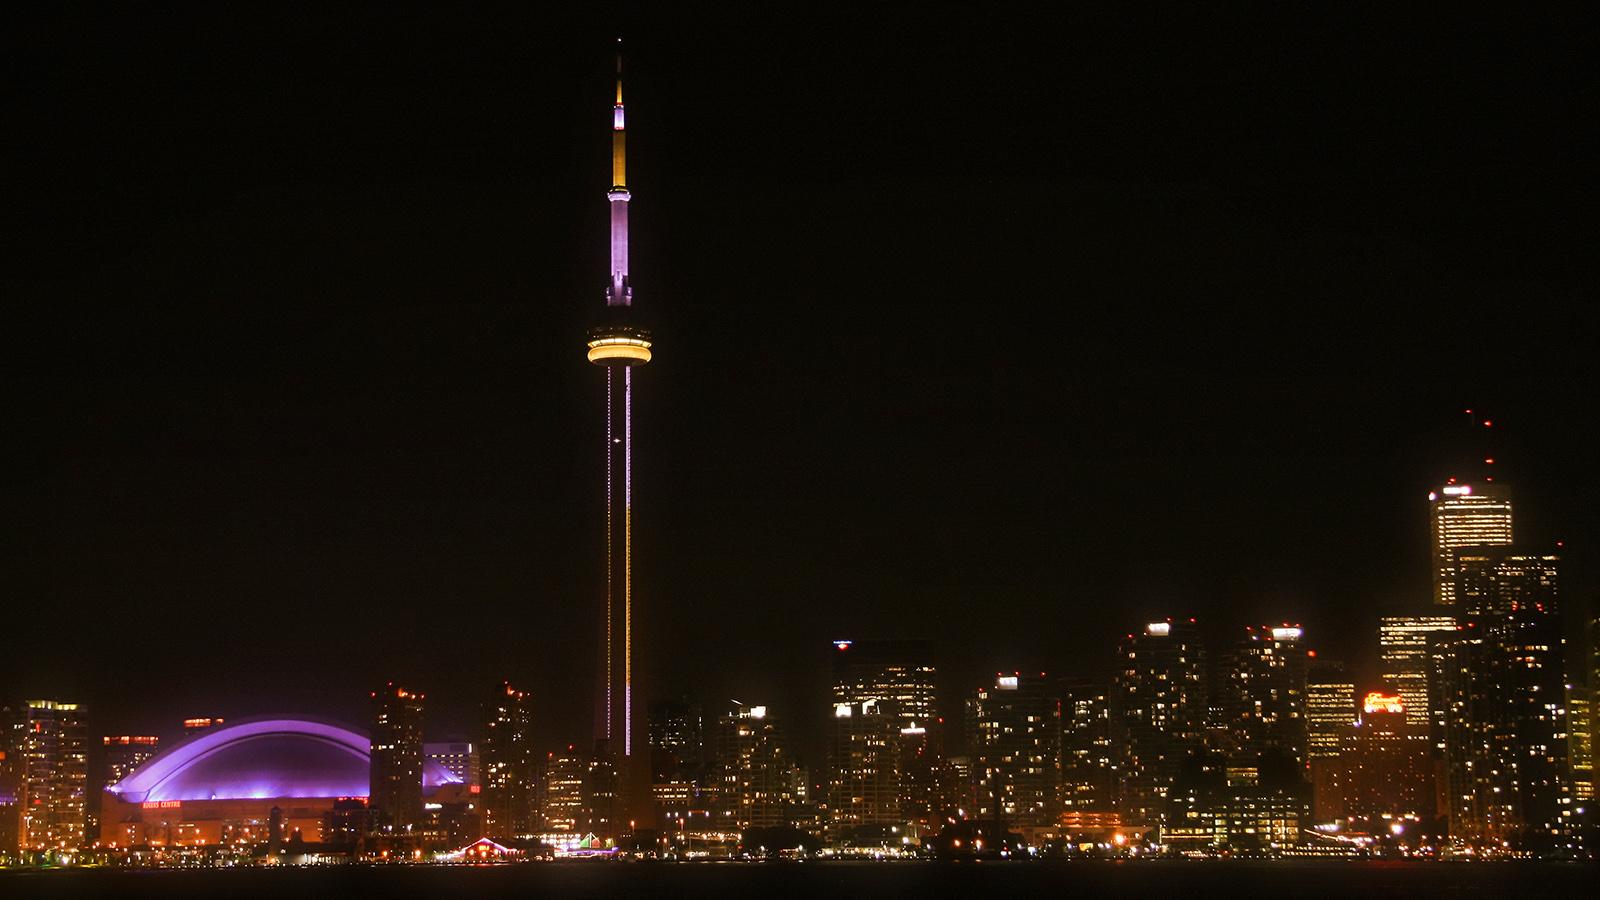 Toronto Skyline Night Wallpaper Garish Toronto Skyline by 1600x900